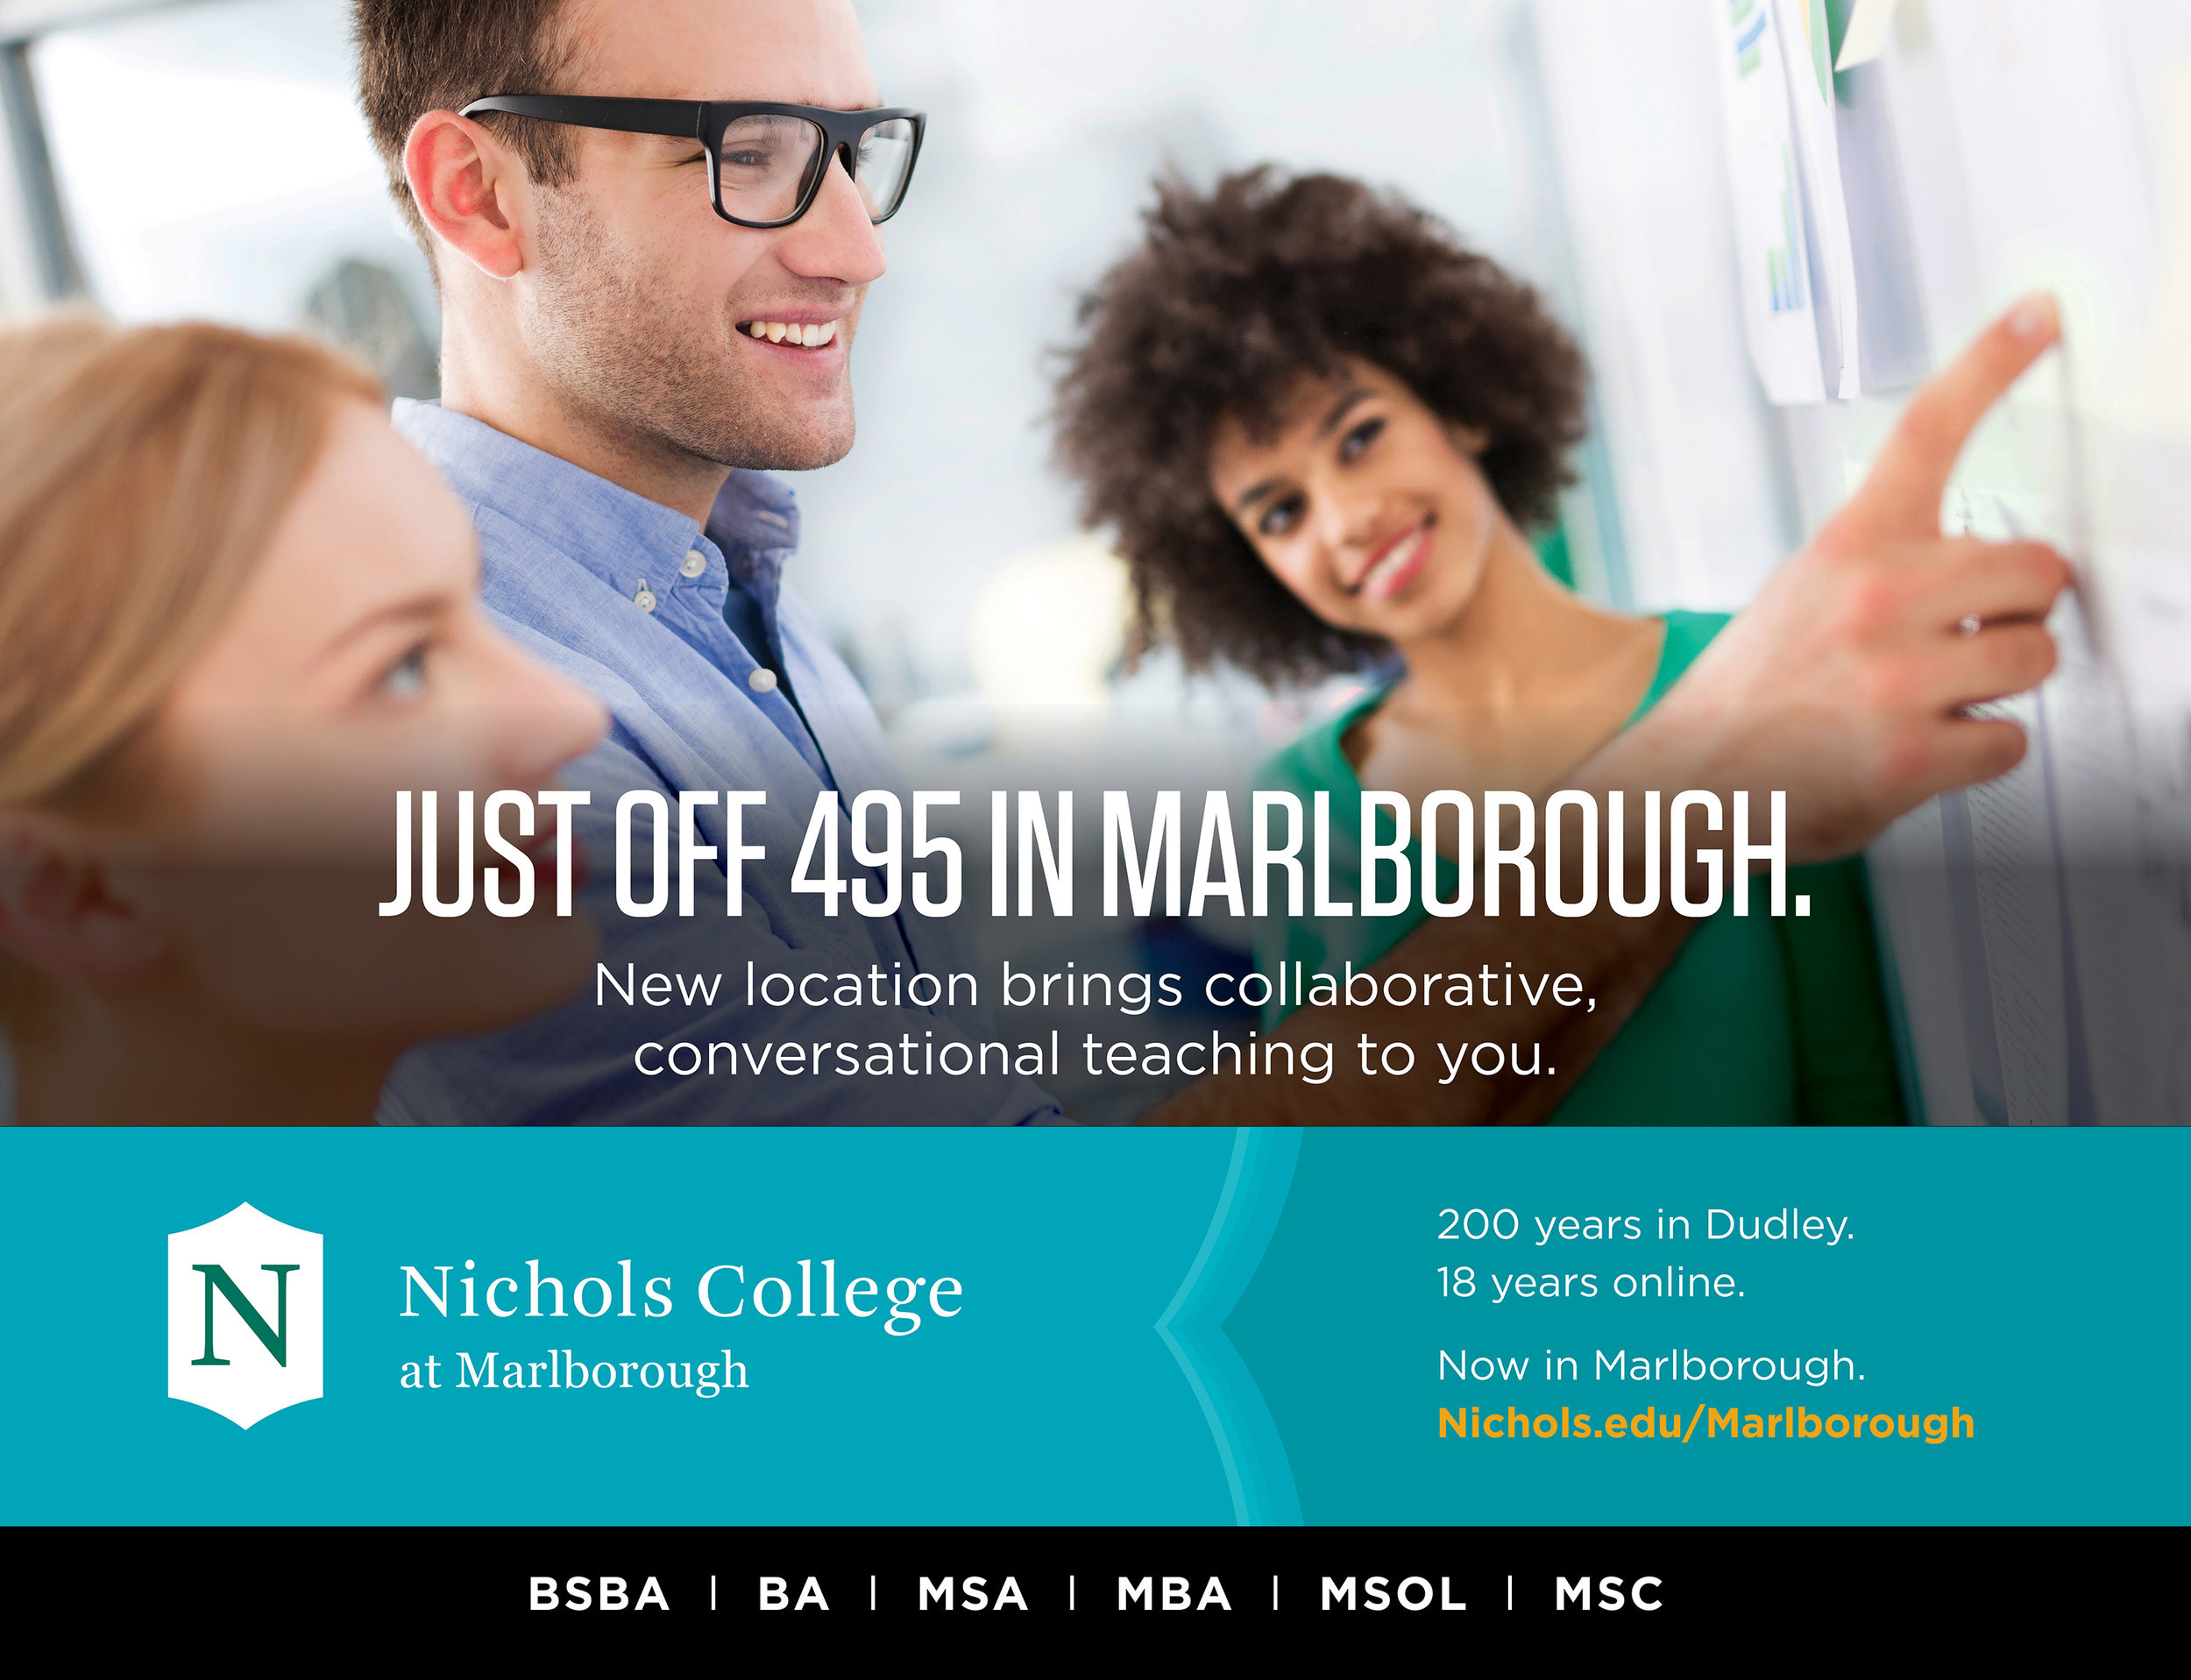 2991NC17_Marlborough Transit posters_Comps5.jpg